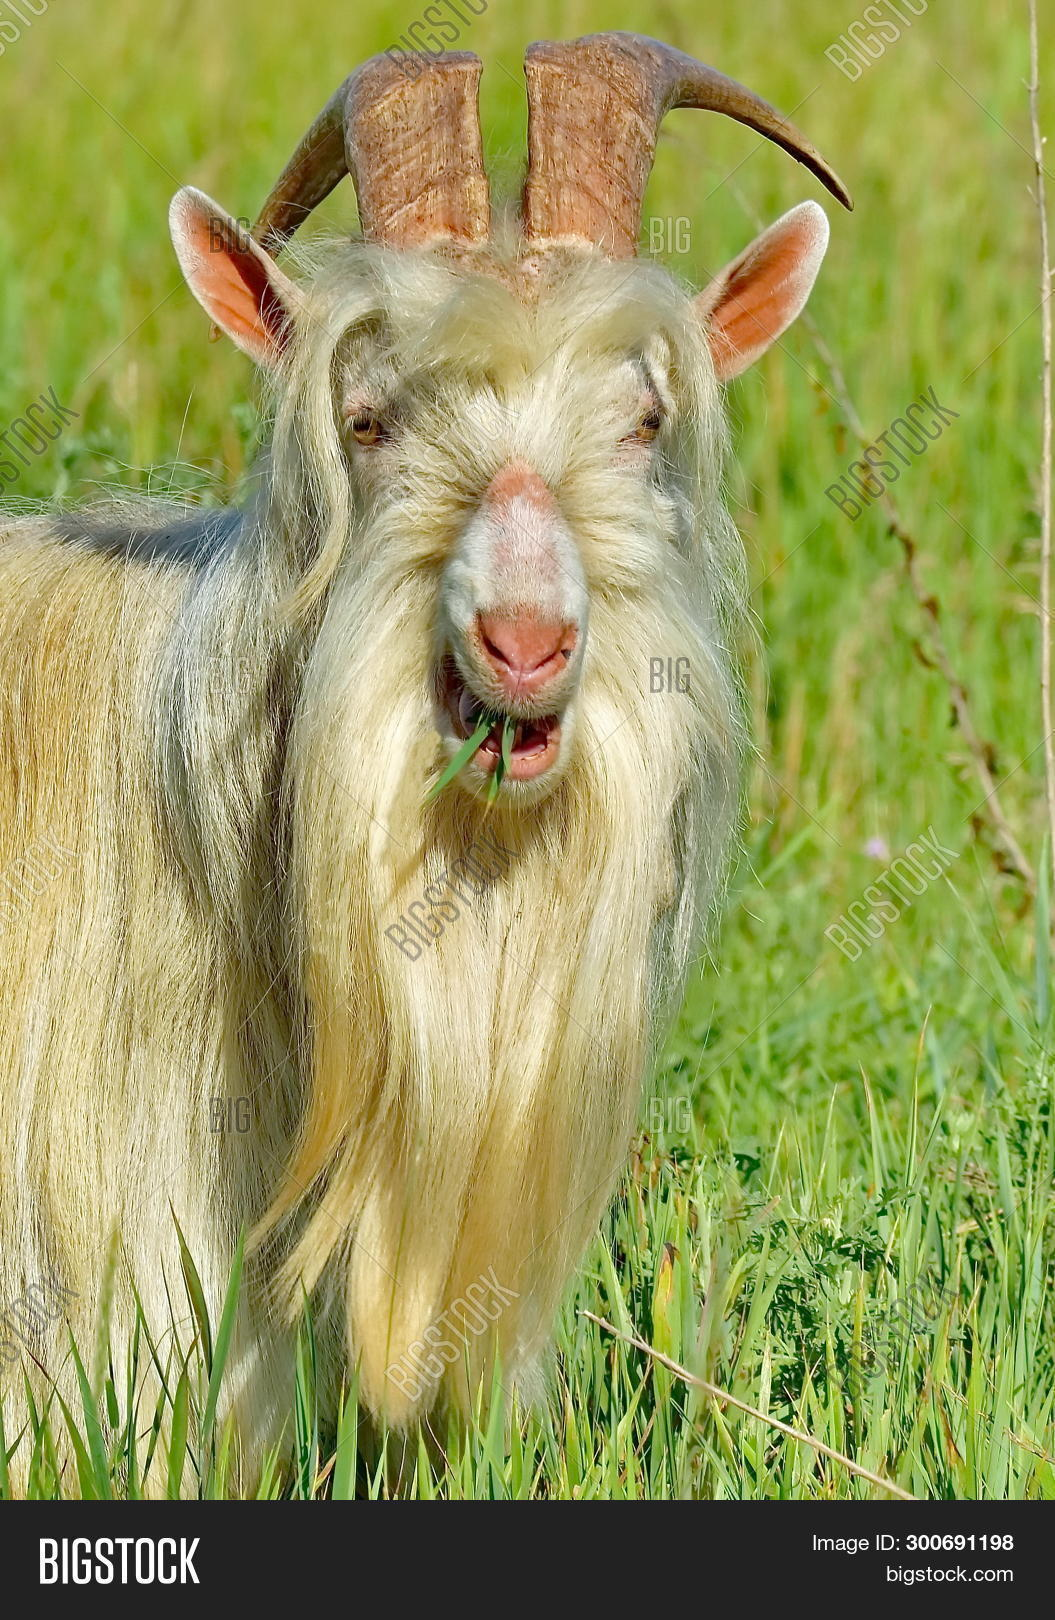 Goat  Portrait, Image & Photo (Free Trial) | Bigstock